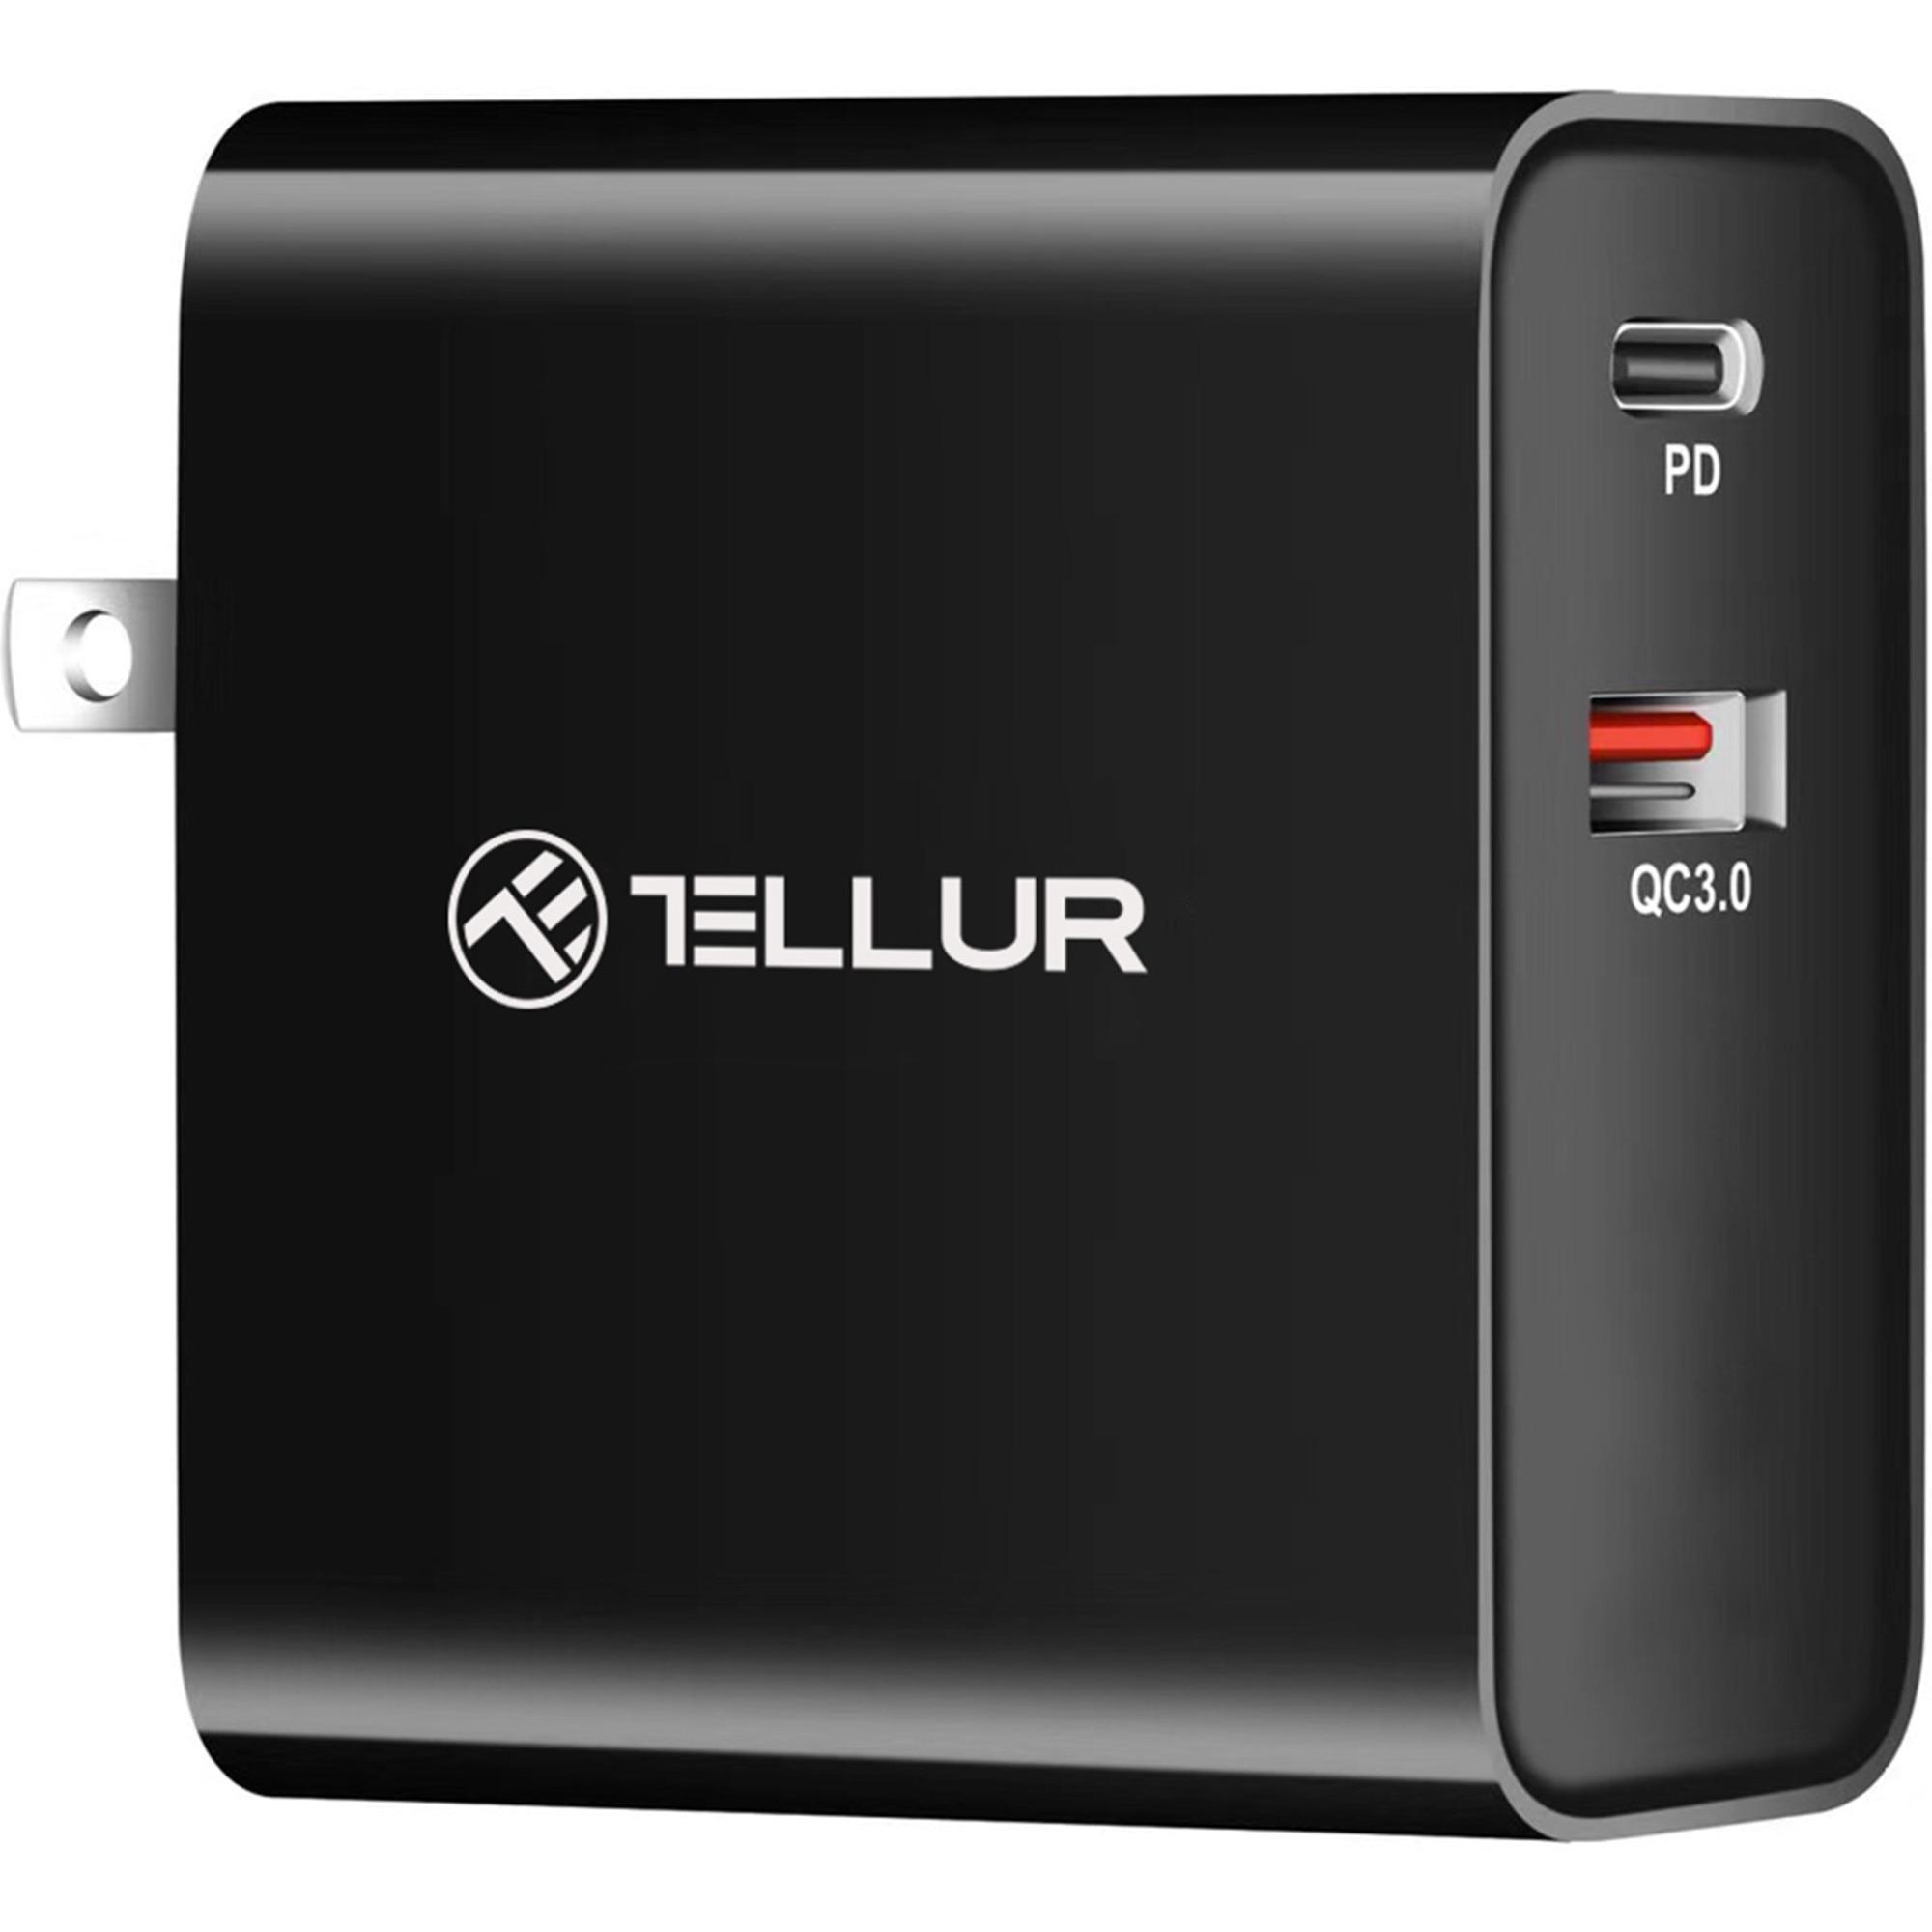 Fotografie Incarcator retea Tellur PDHC1 48W PD30W + QC3.0, 3 adaptoare priza (US, EU, UK), Negru